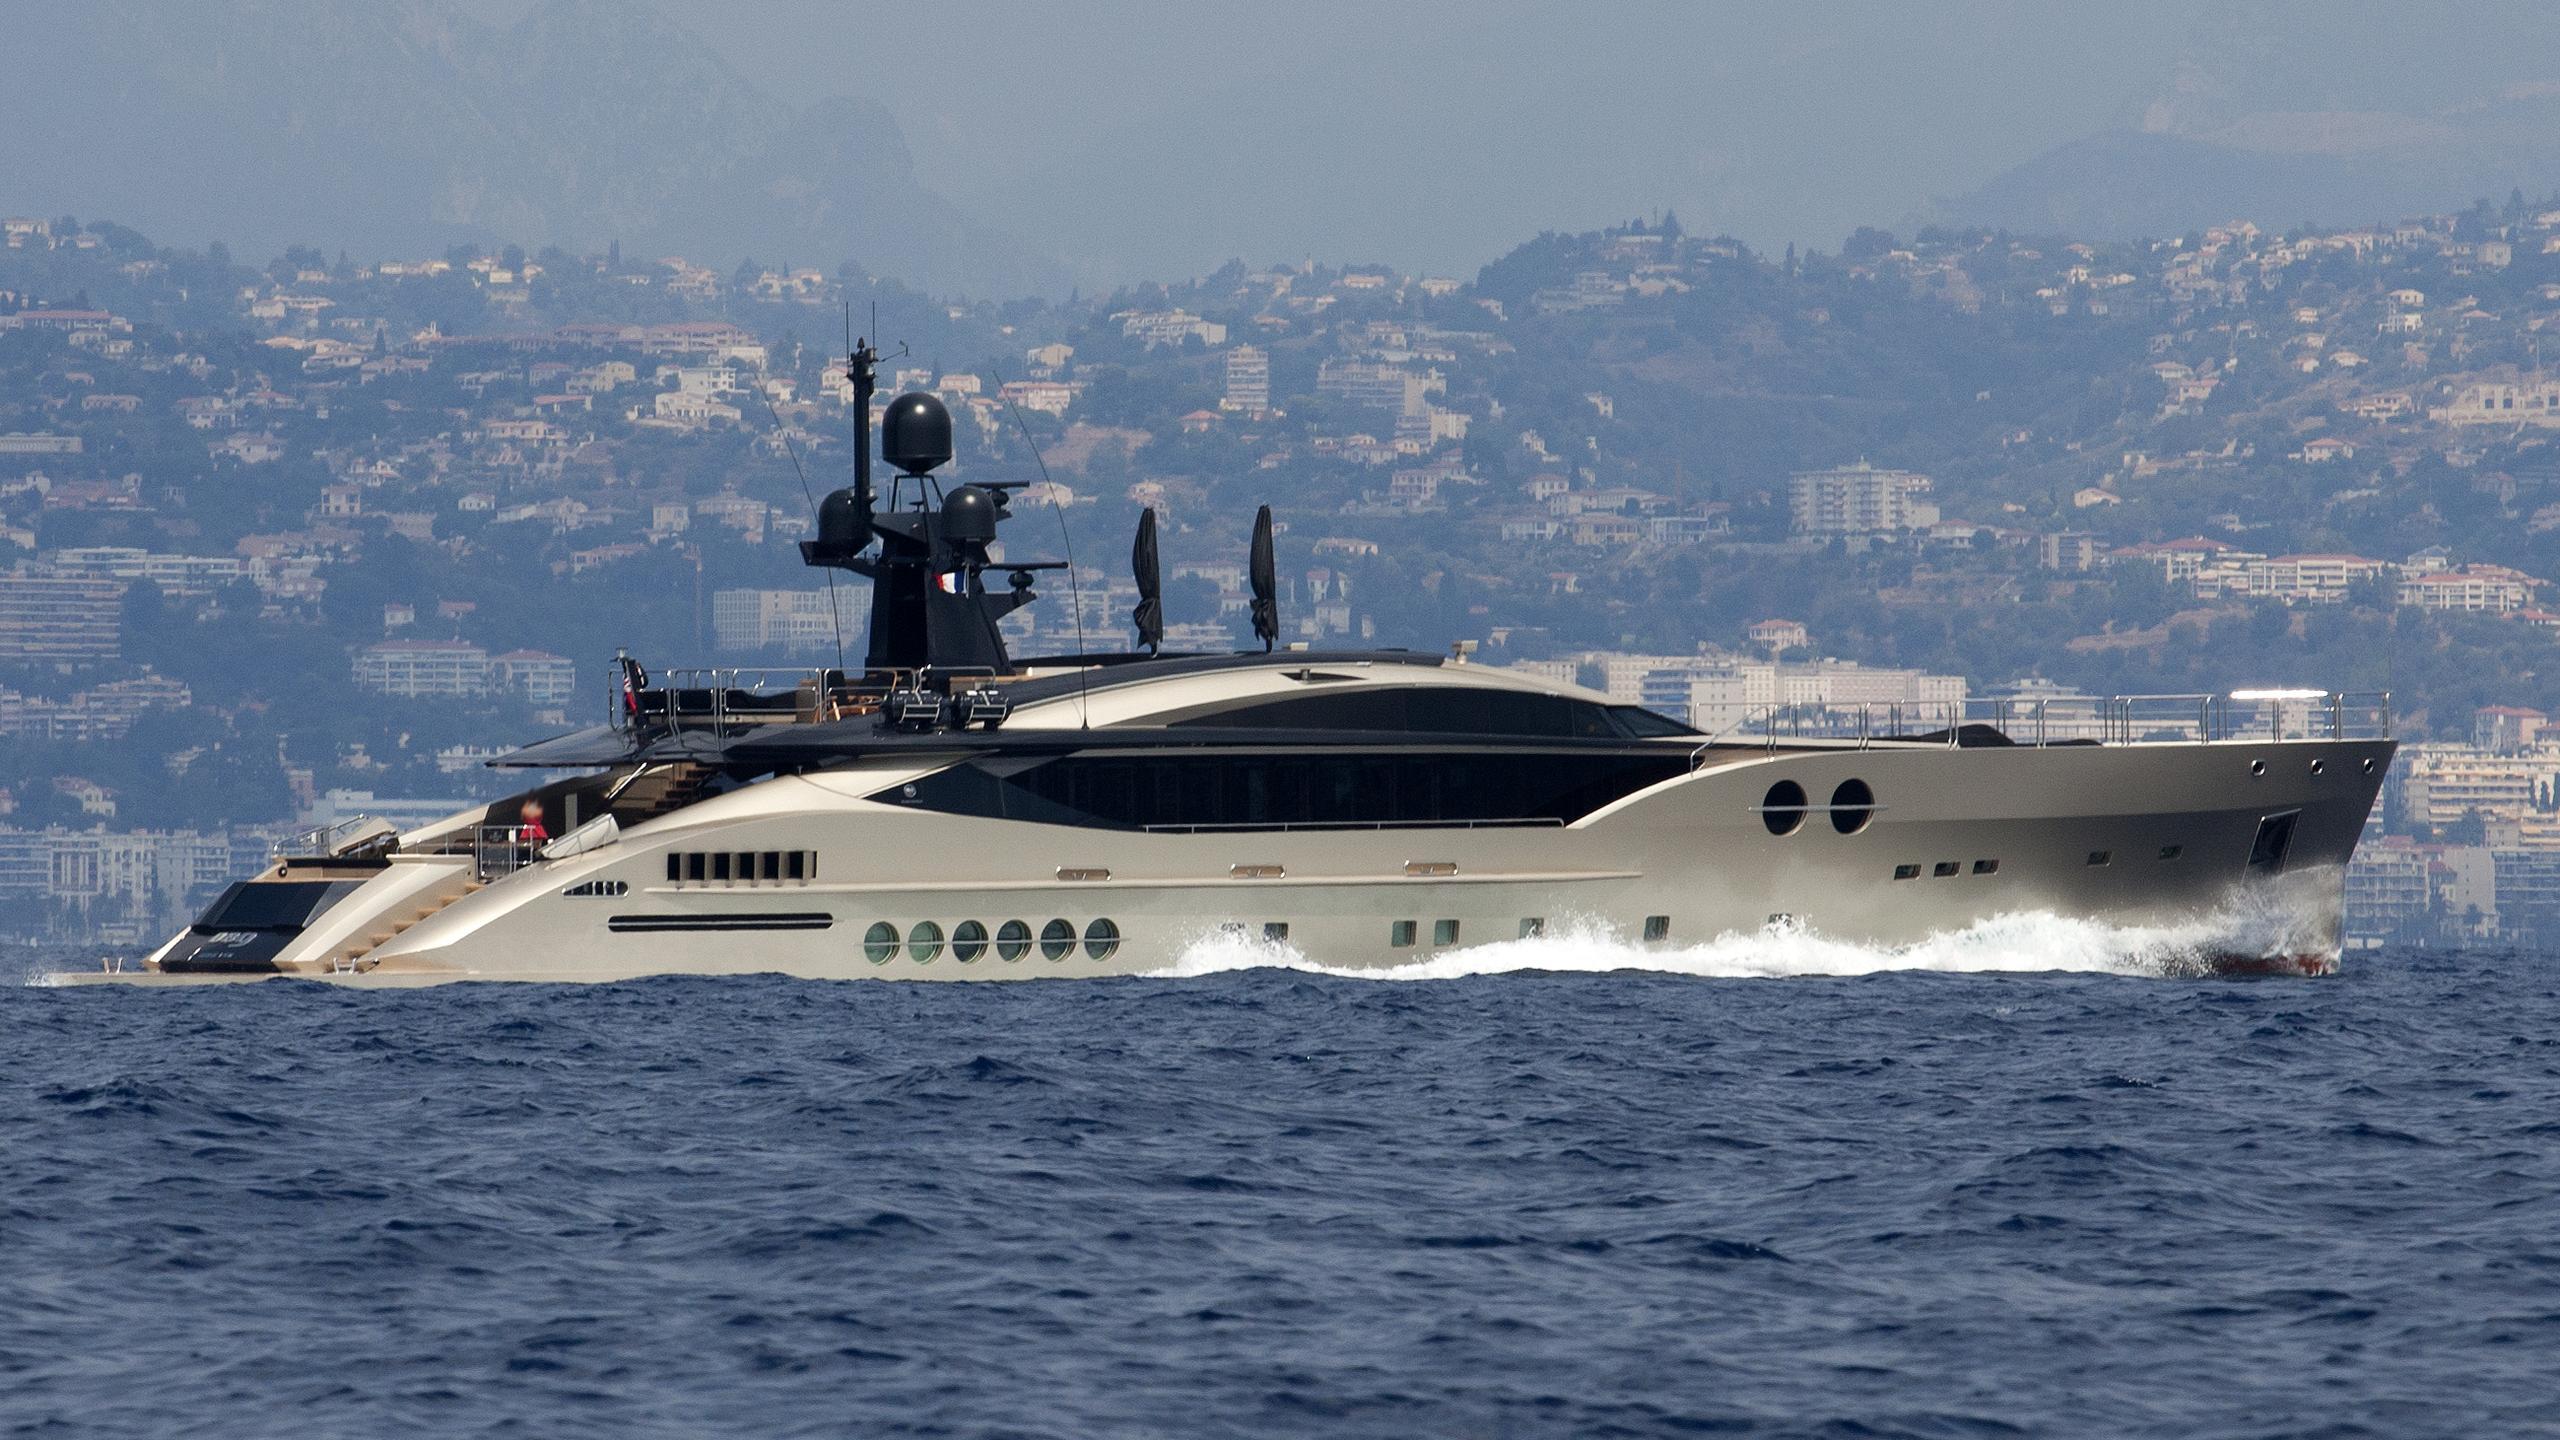 db9-yacht-exterior